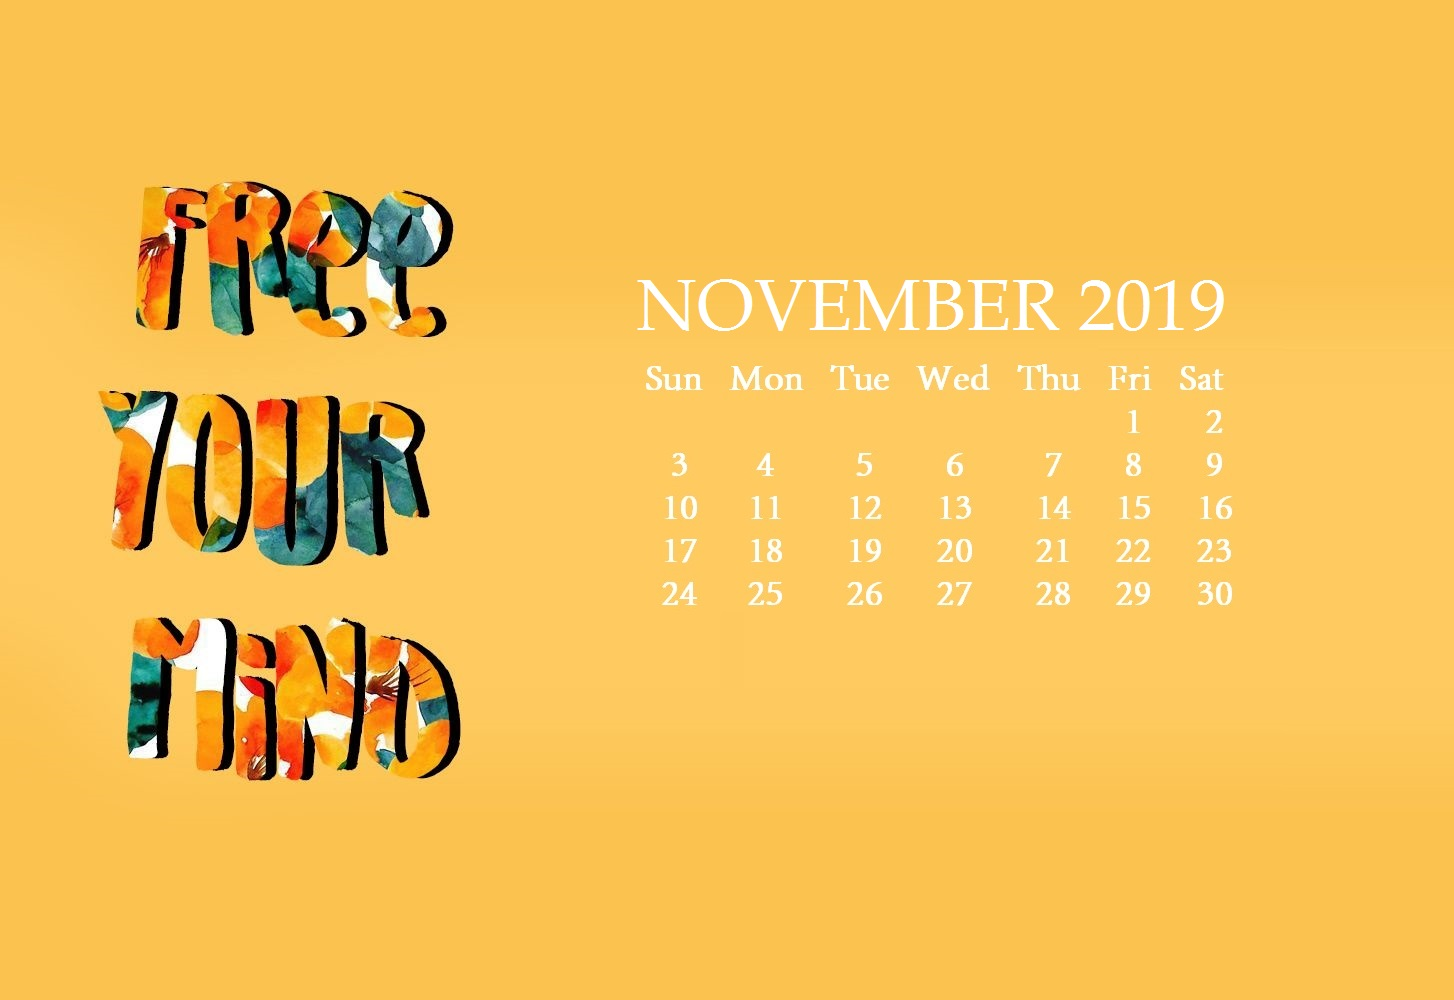 November 2019 Cute Background Calendar